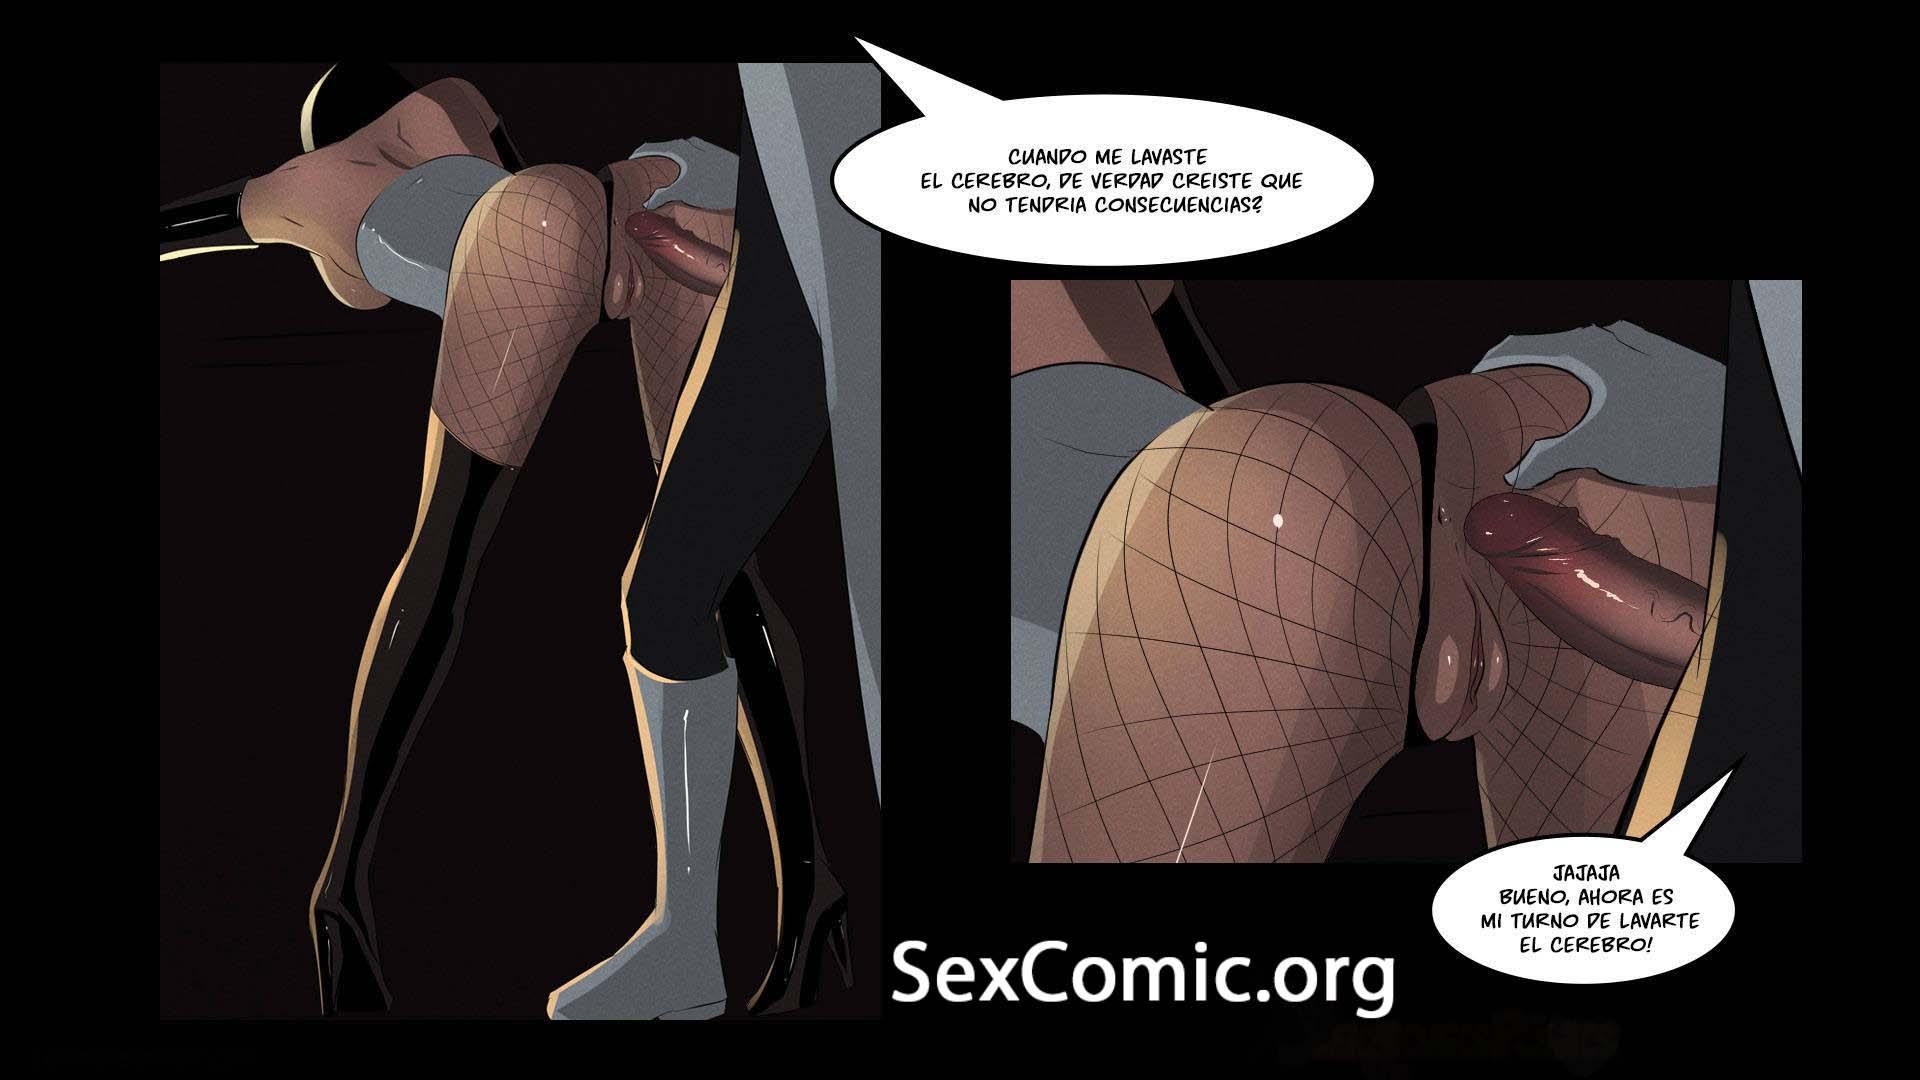 comics-marvel-xxx-vengandose-de-zatana-mangas-para-adultos-fantasias-sexuales-hentai-videos-porno-gratis-comics-de-zoofilia-comics-incesto-9